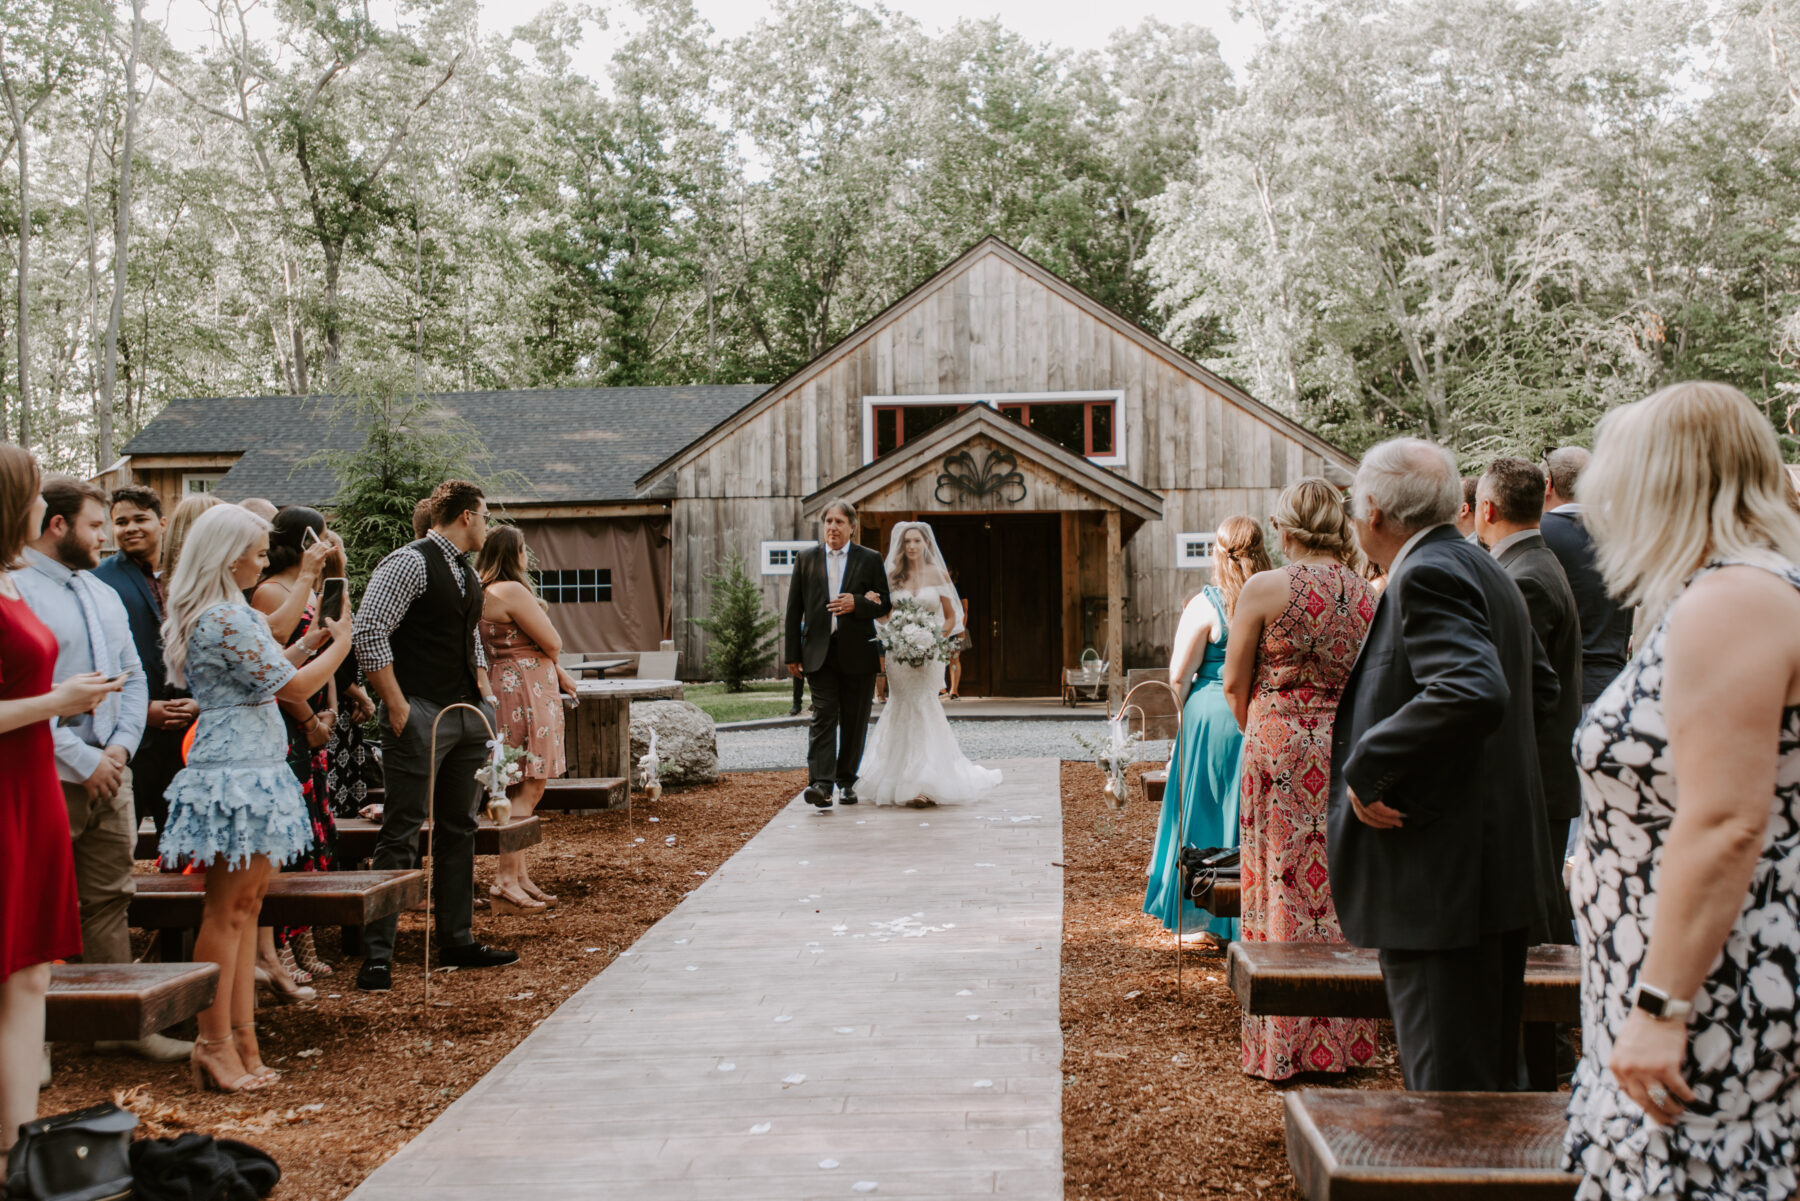 Five Bridge Inn Rehoboth Wedding Katie and Enrique Blueflash Photography 20